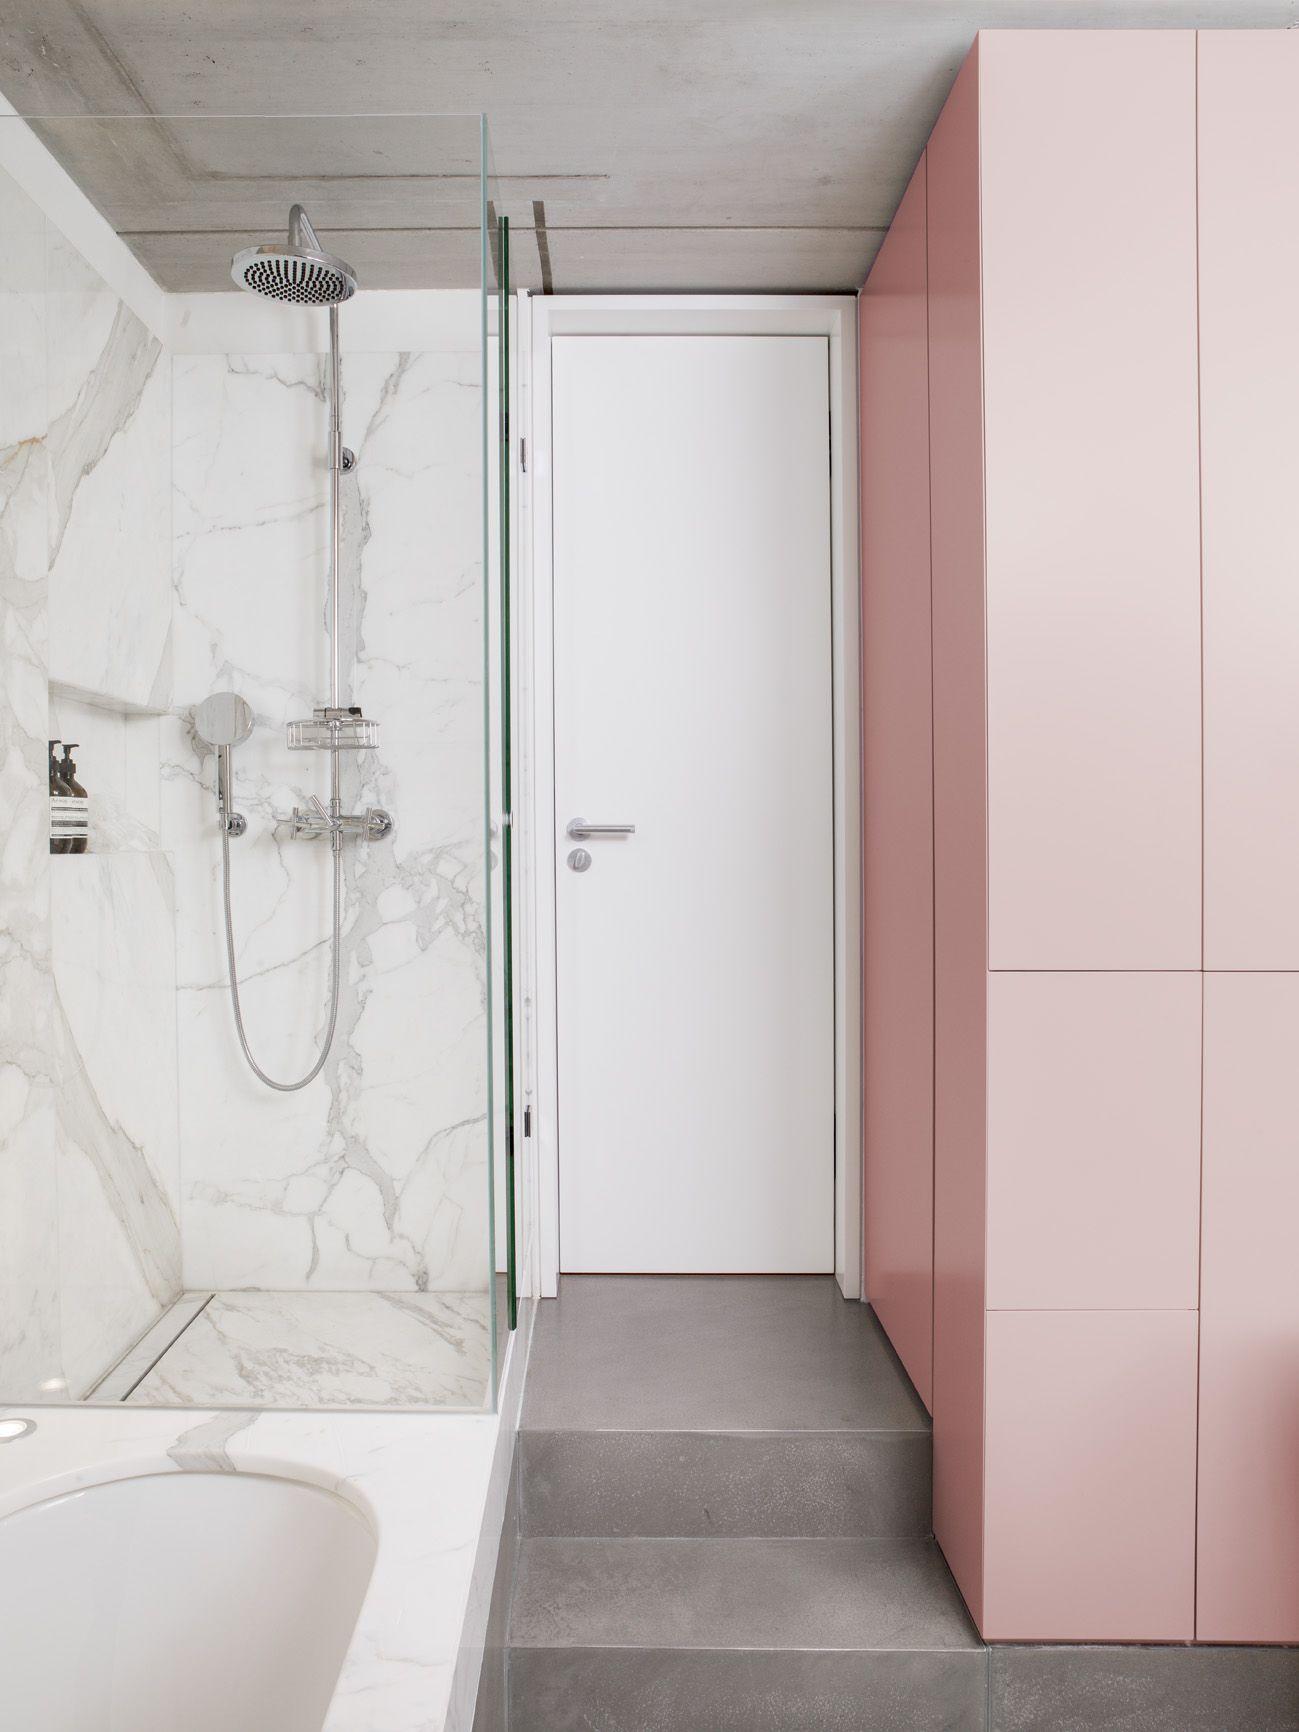 Berlin Loft Style Room Concret Floor Marble Japanese Inspiration Changes Room Heights Difference P Badezimmer Innenausstattung Rosa Badezimmer Haus